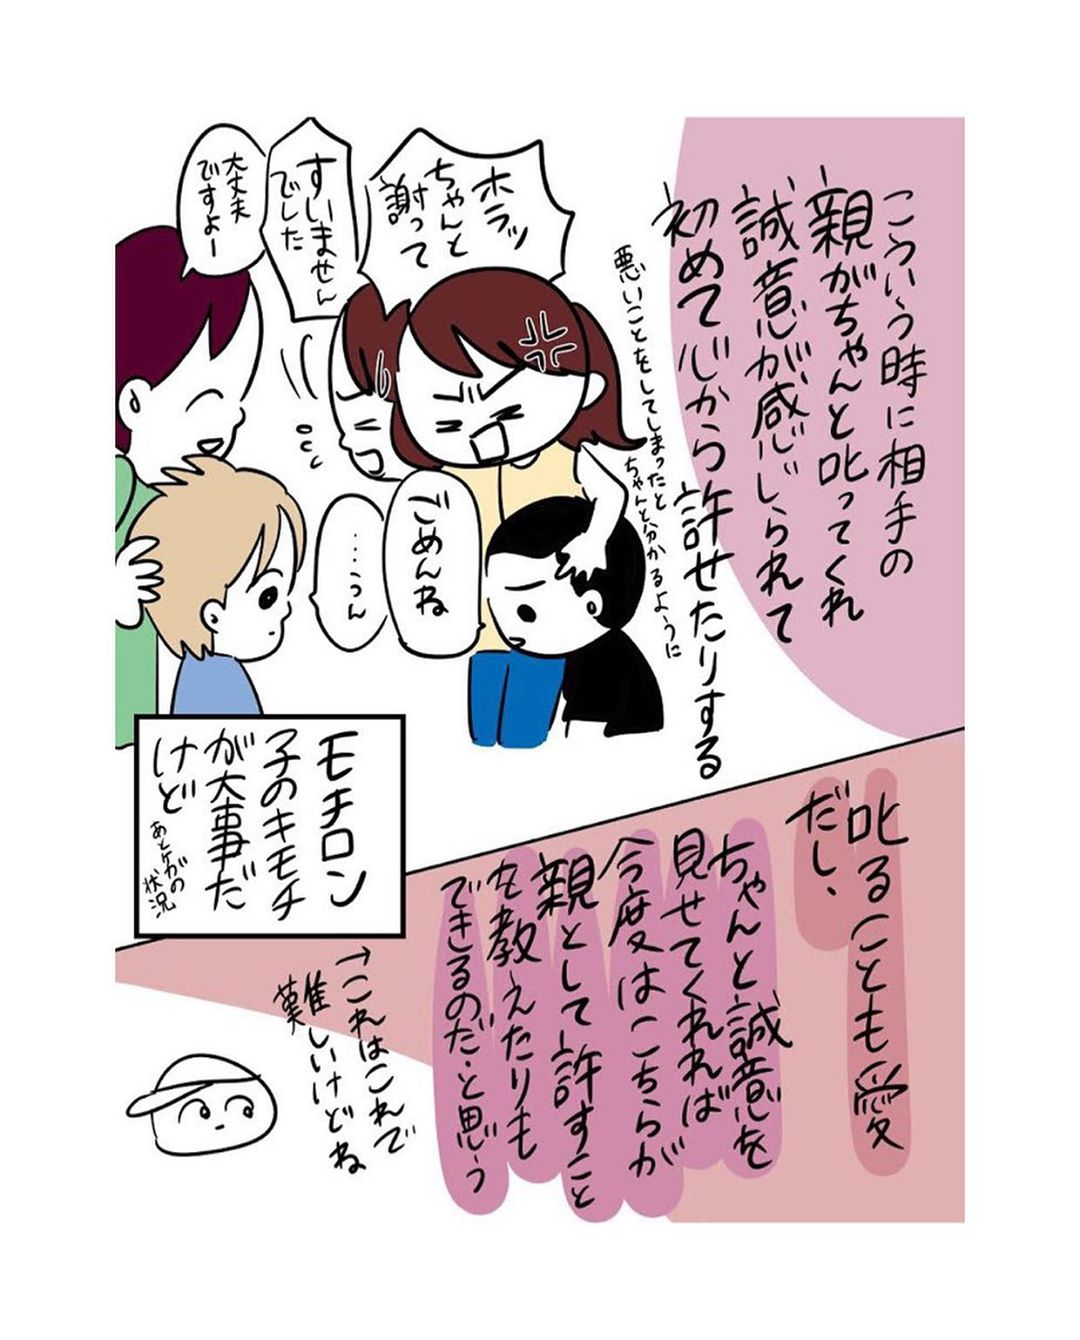 shirota.yunya_75392909_951543825215224_6133412263676461042_n